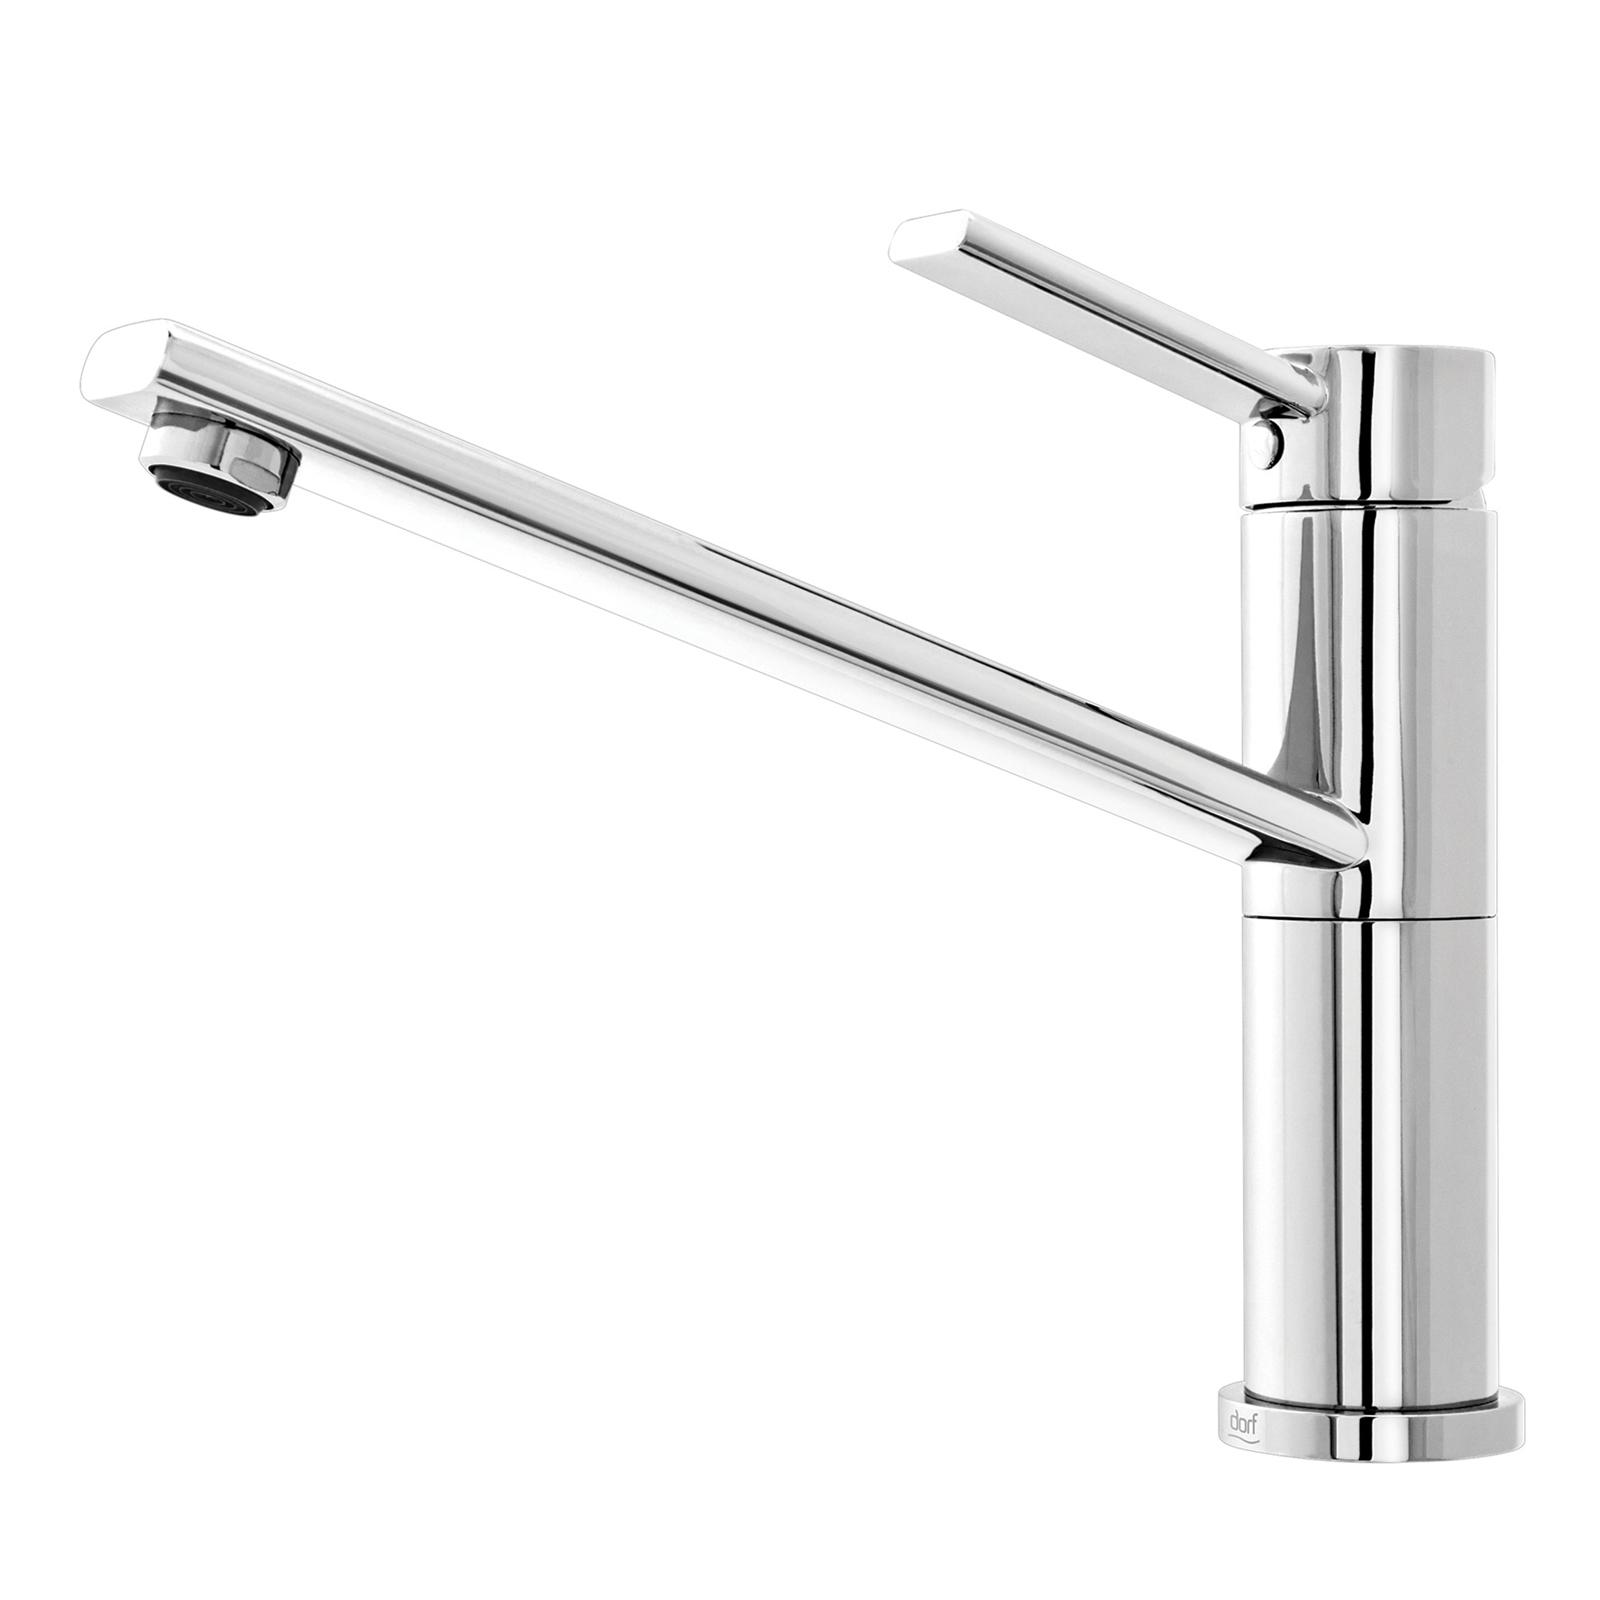 Dorf WELS 4 Star 7.5L/min Chrome Villa Sink Mixer